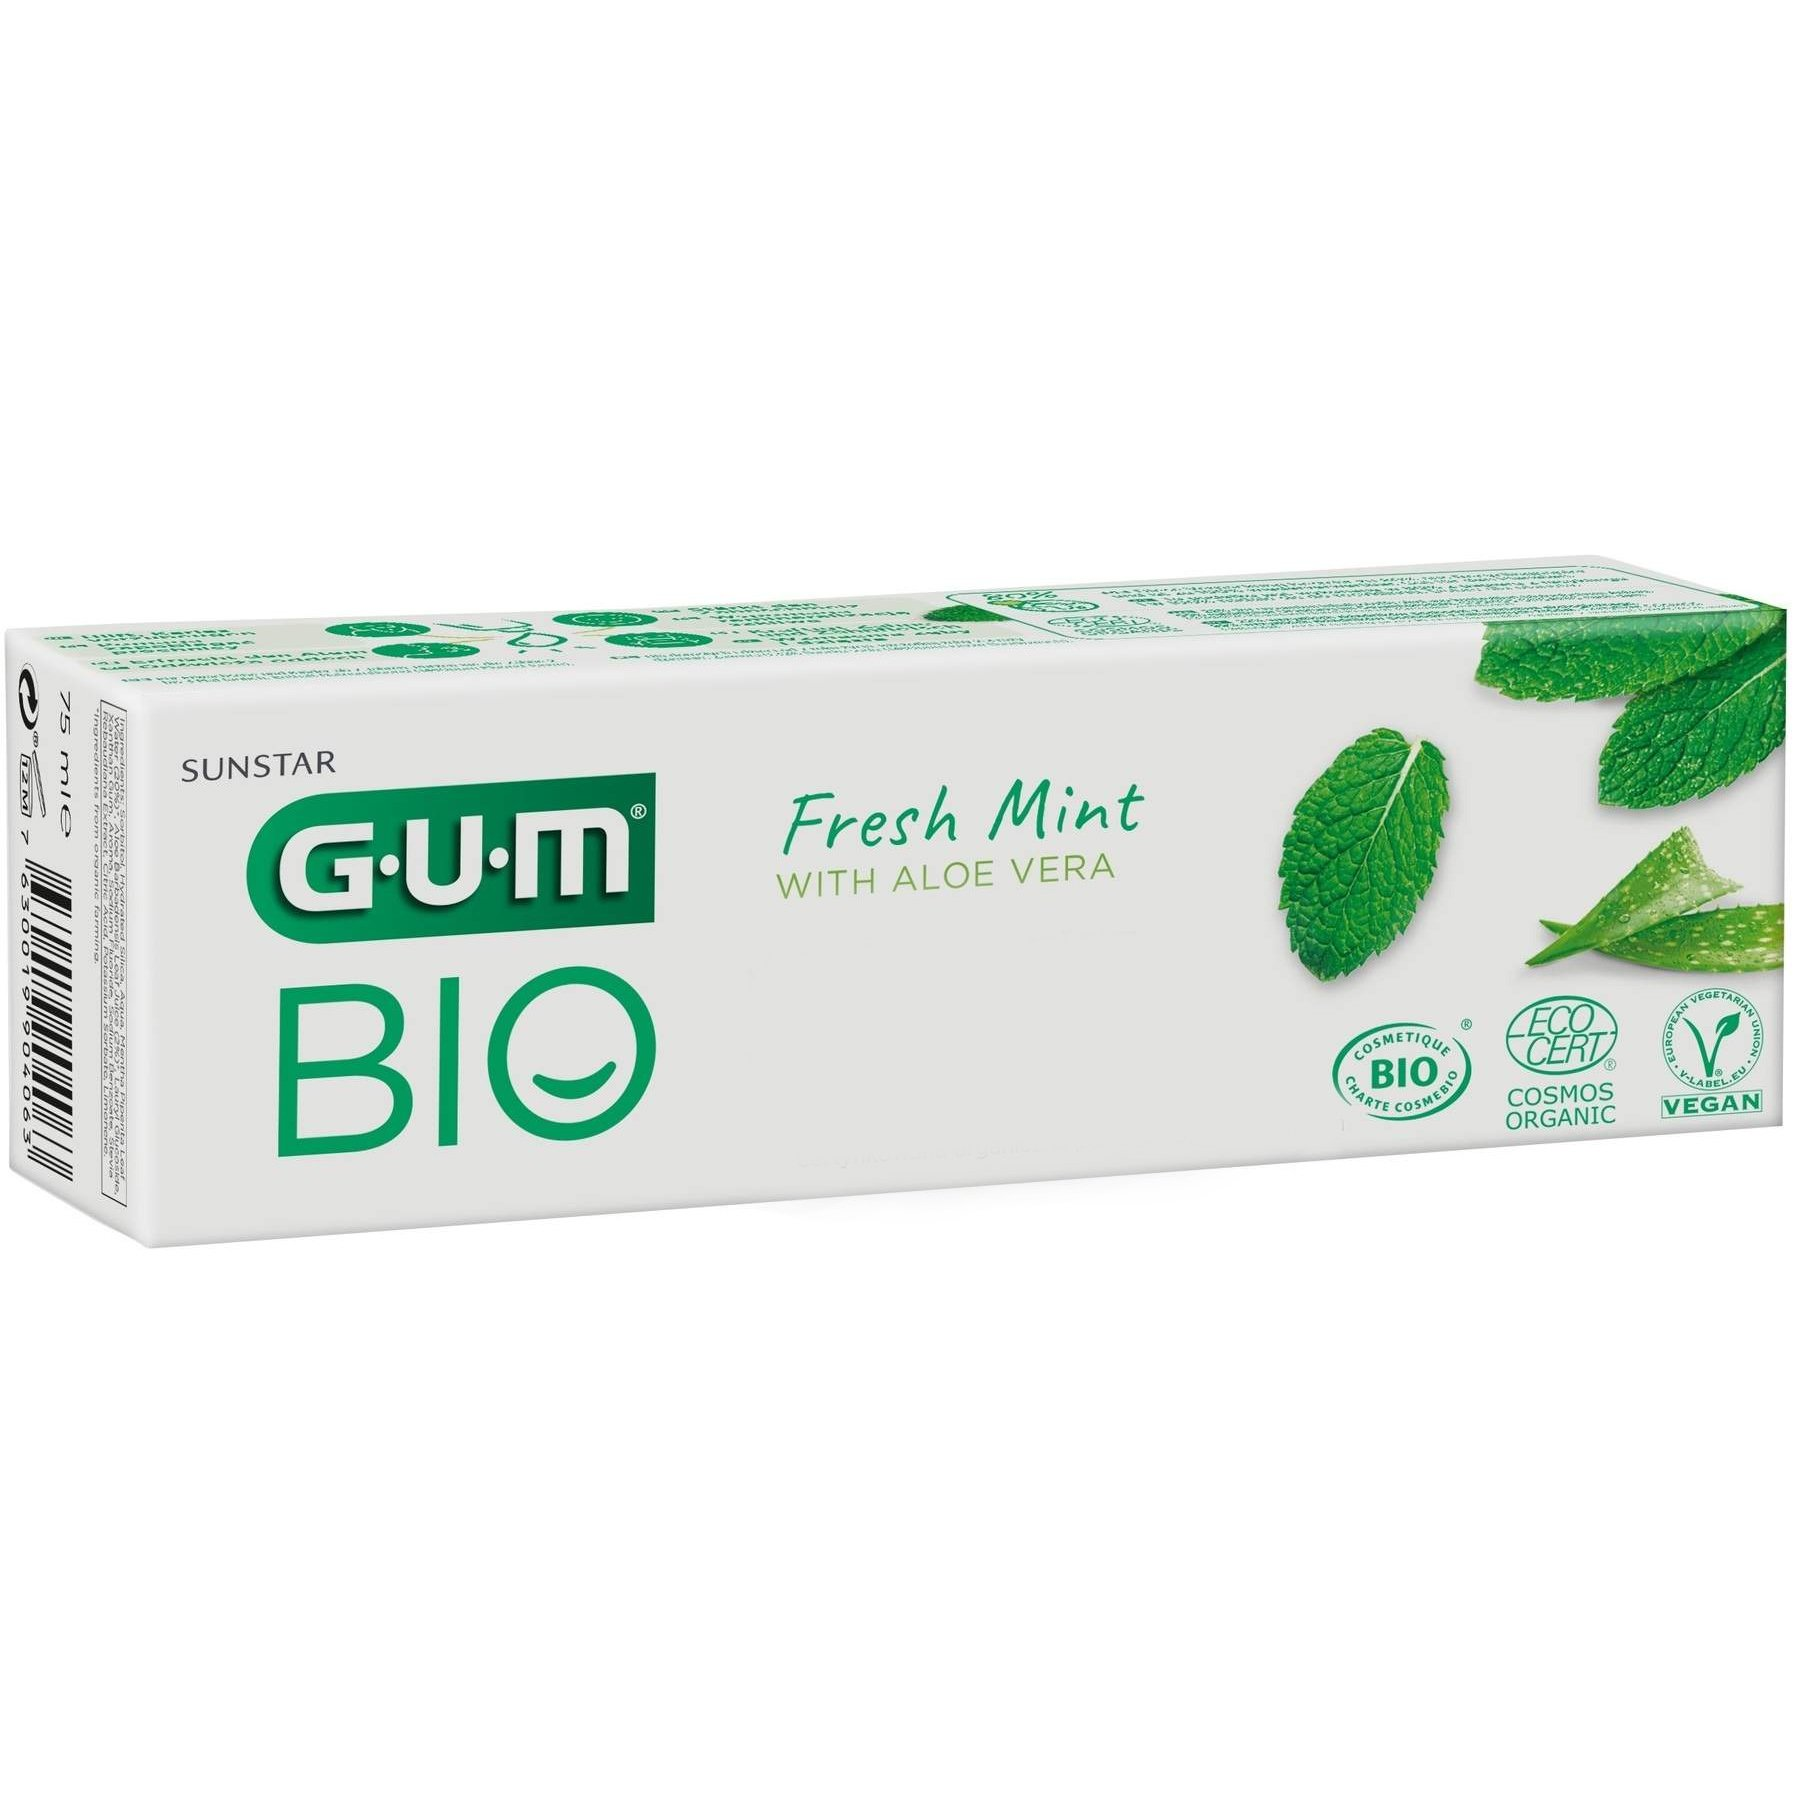 Gum Bio Fresh Mint Toothpaste with Aloe Vera Πιστοποιημένη Οργανική Οδοντόπαστα που Προστατεύει & Ενδυναμώνει Δόντια & Ούλα 75ml